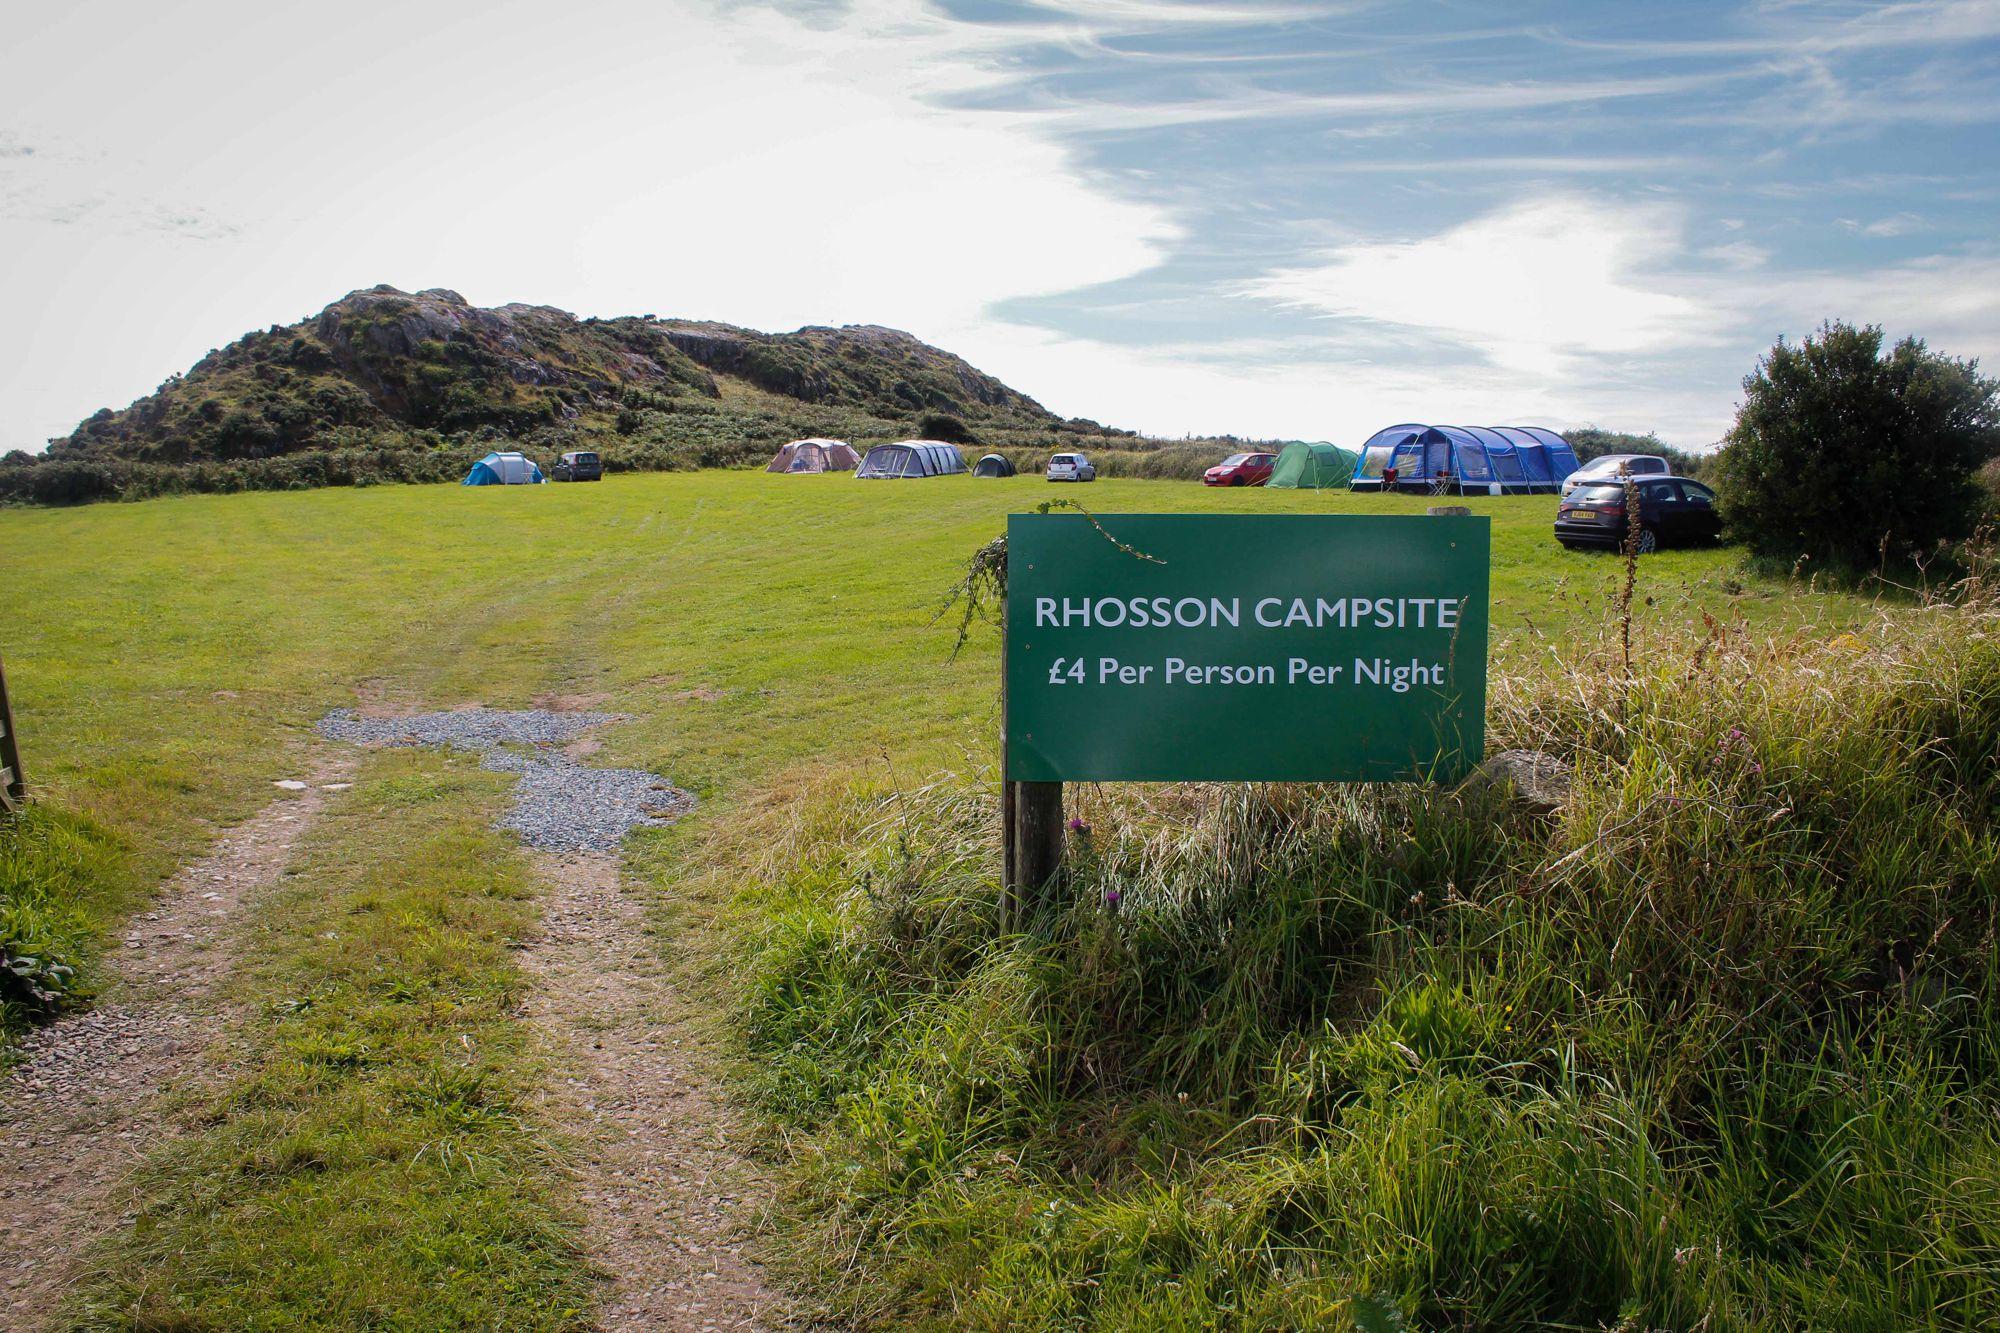 Rhosson Campsite